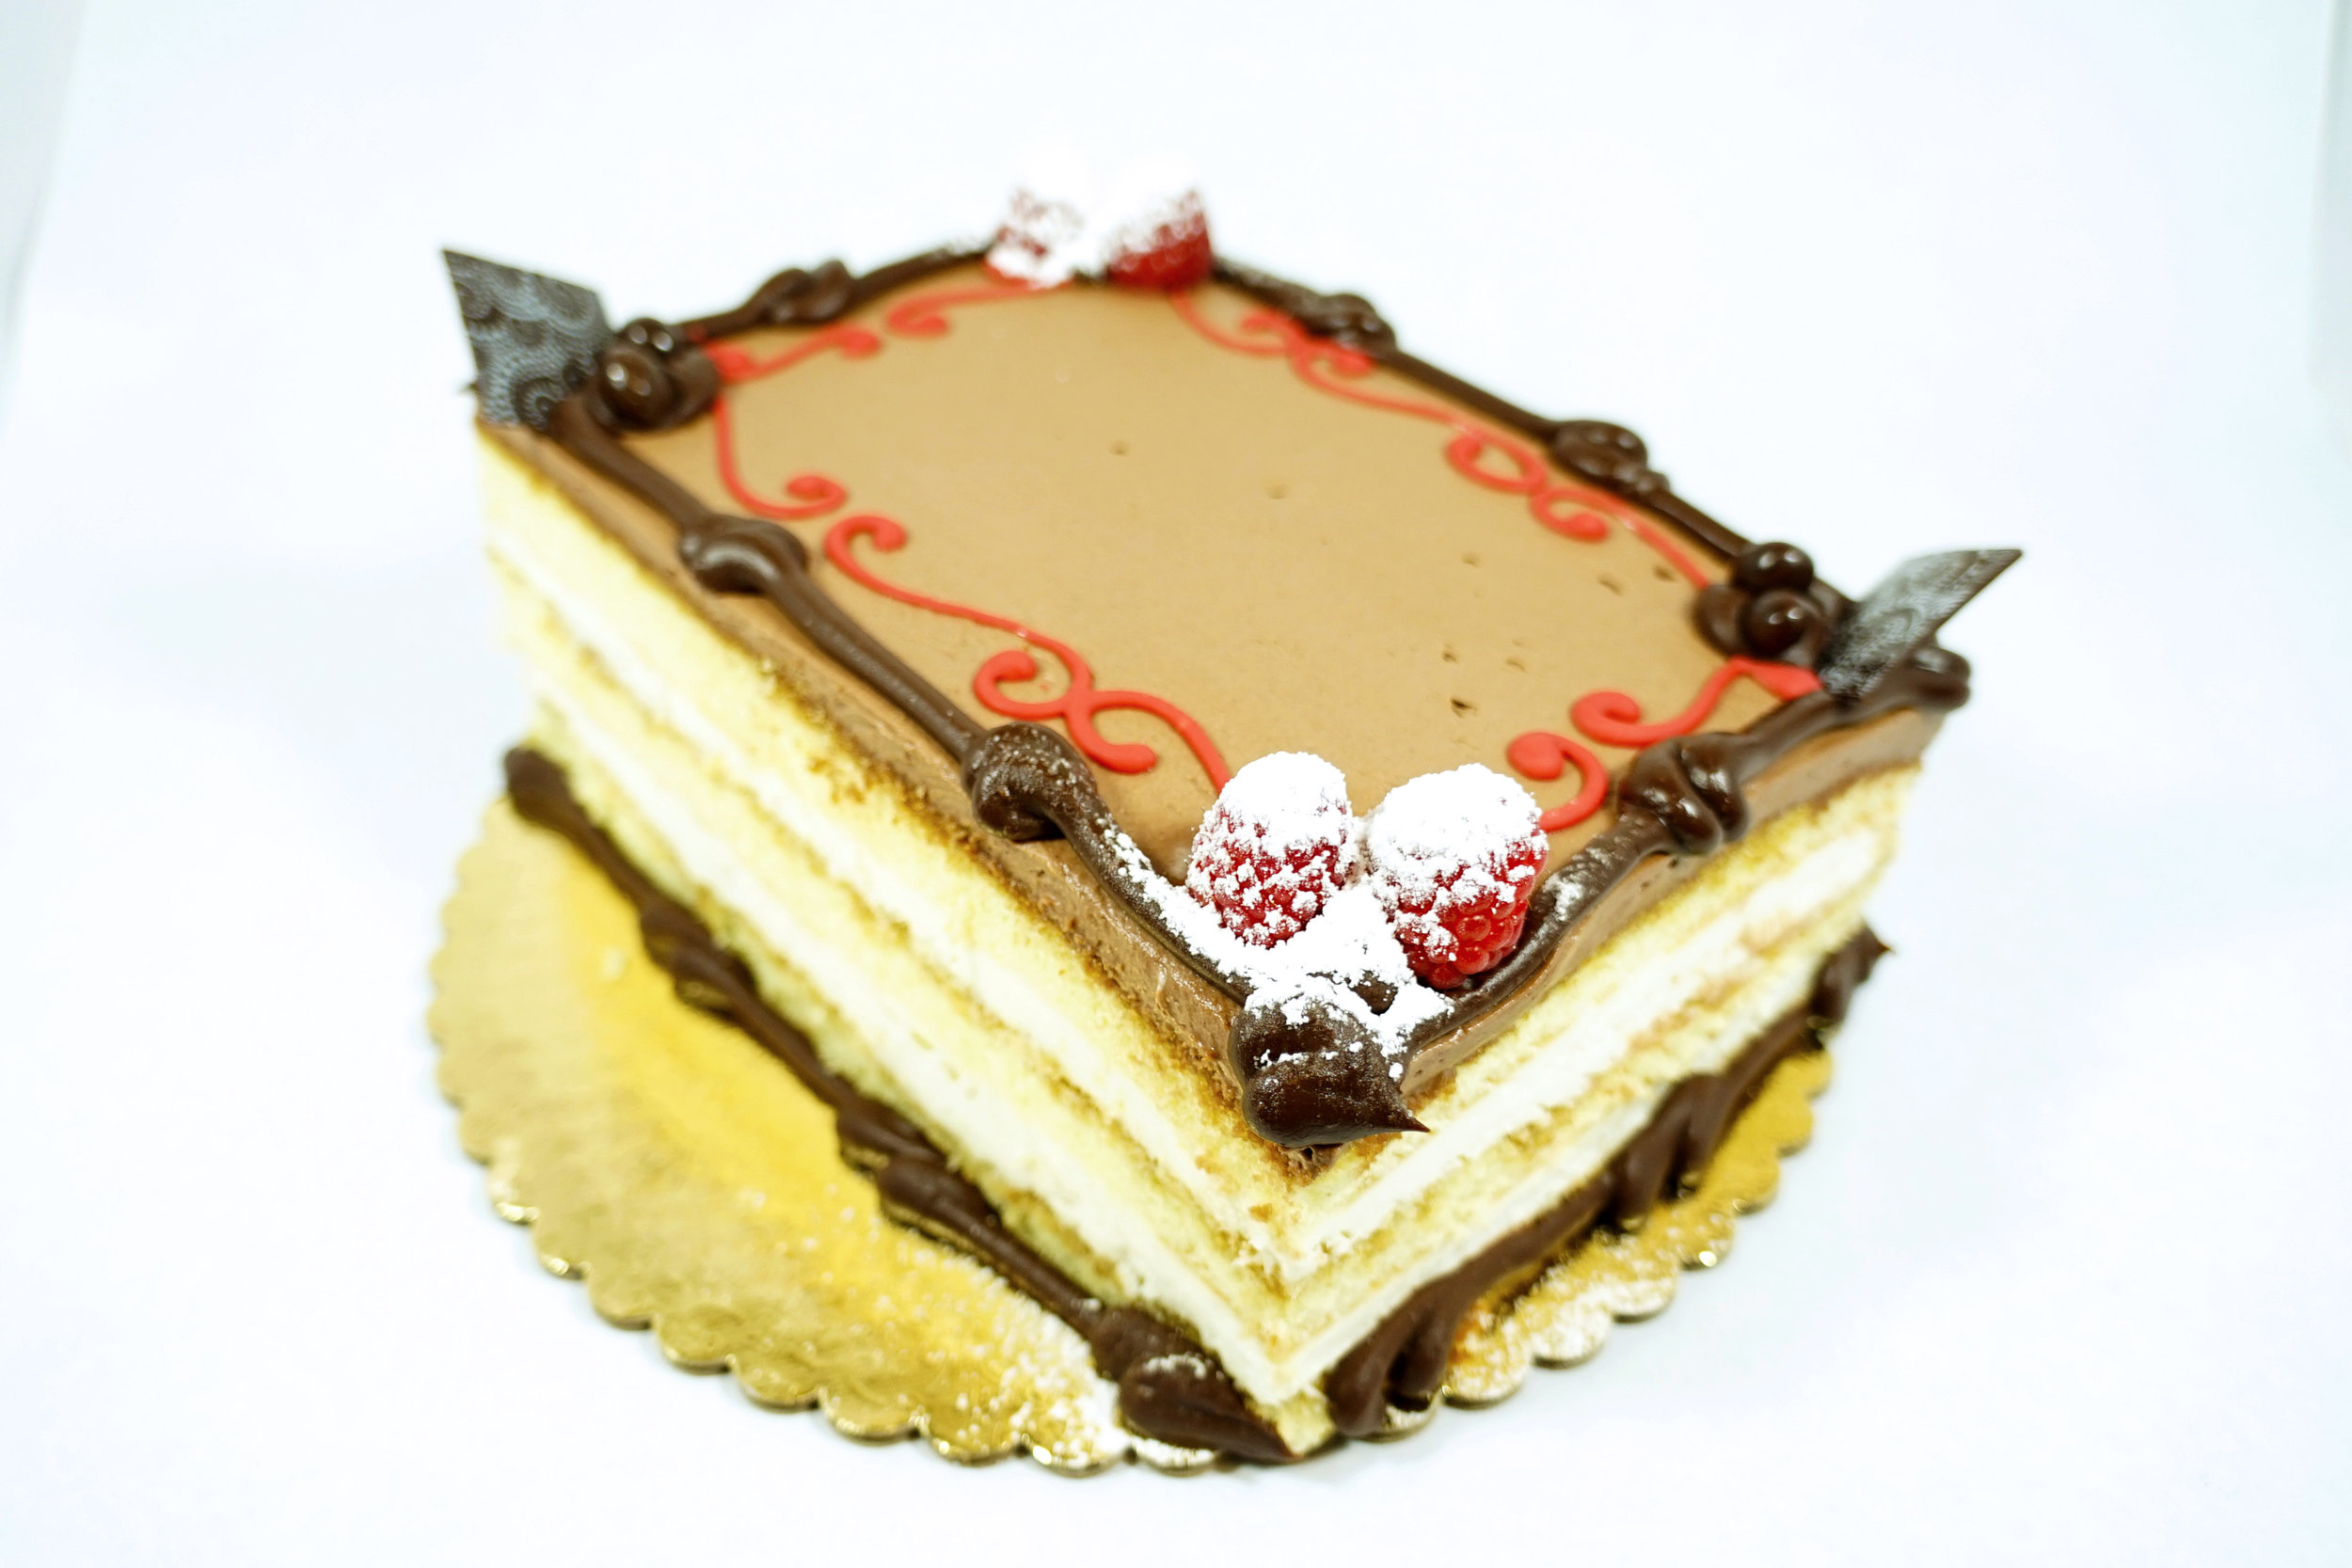 Tiramisu - Genoise cake with rum syrup, tiramisu syrup and mascopone cream cheese filling. Topped with chocolate whipped cream.